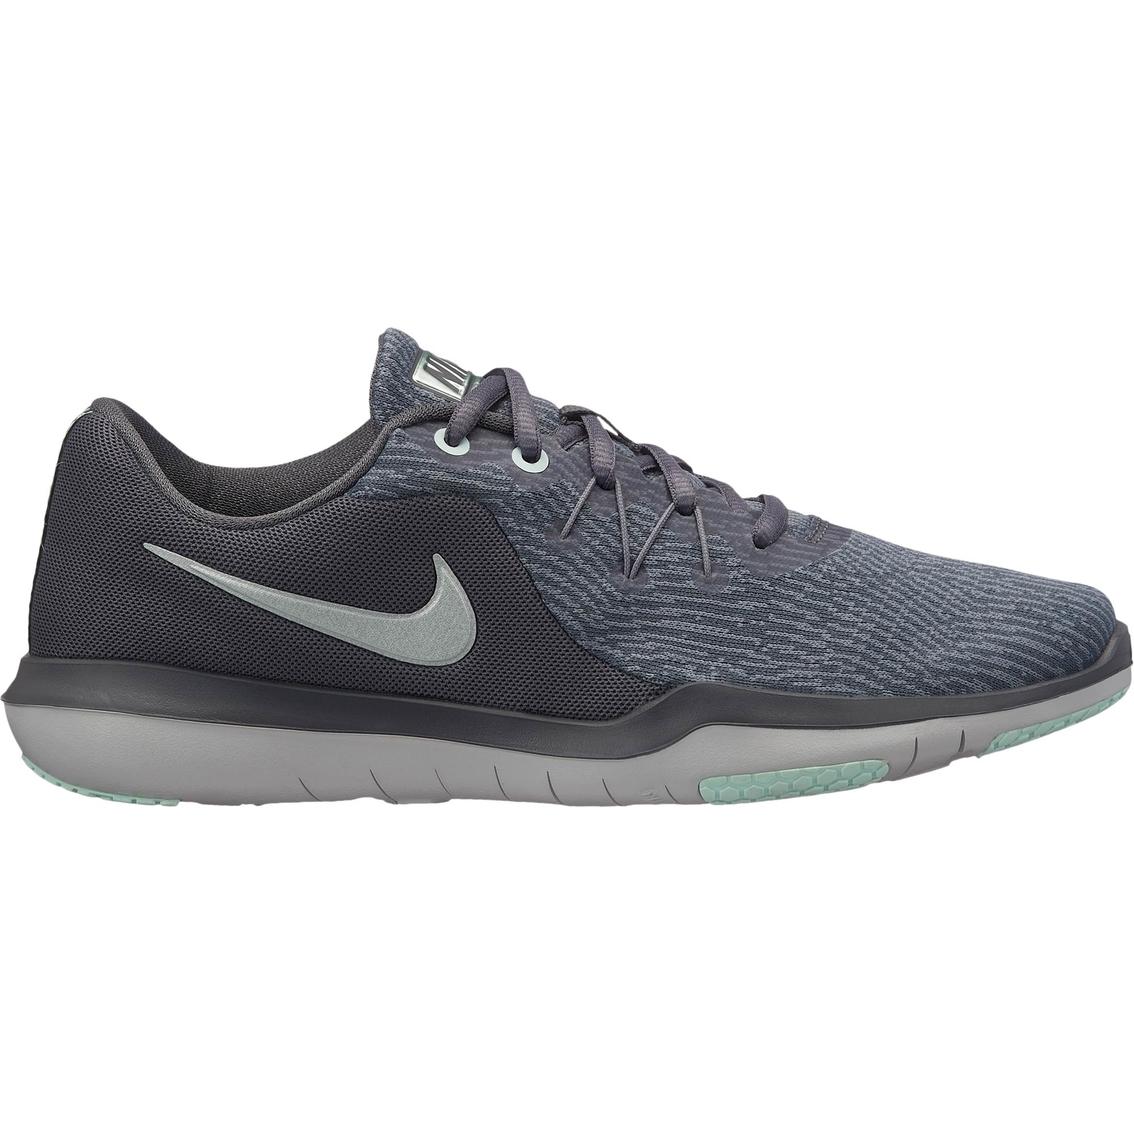 ca120a5147f Nike Women s Flex Supreme Training 6 Shoes